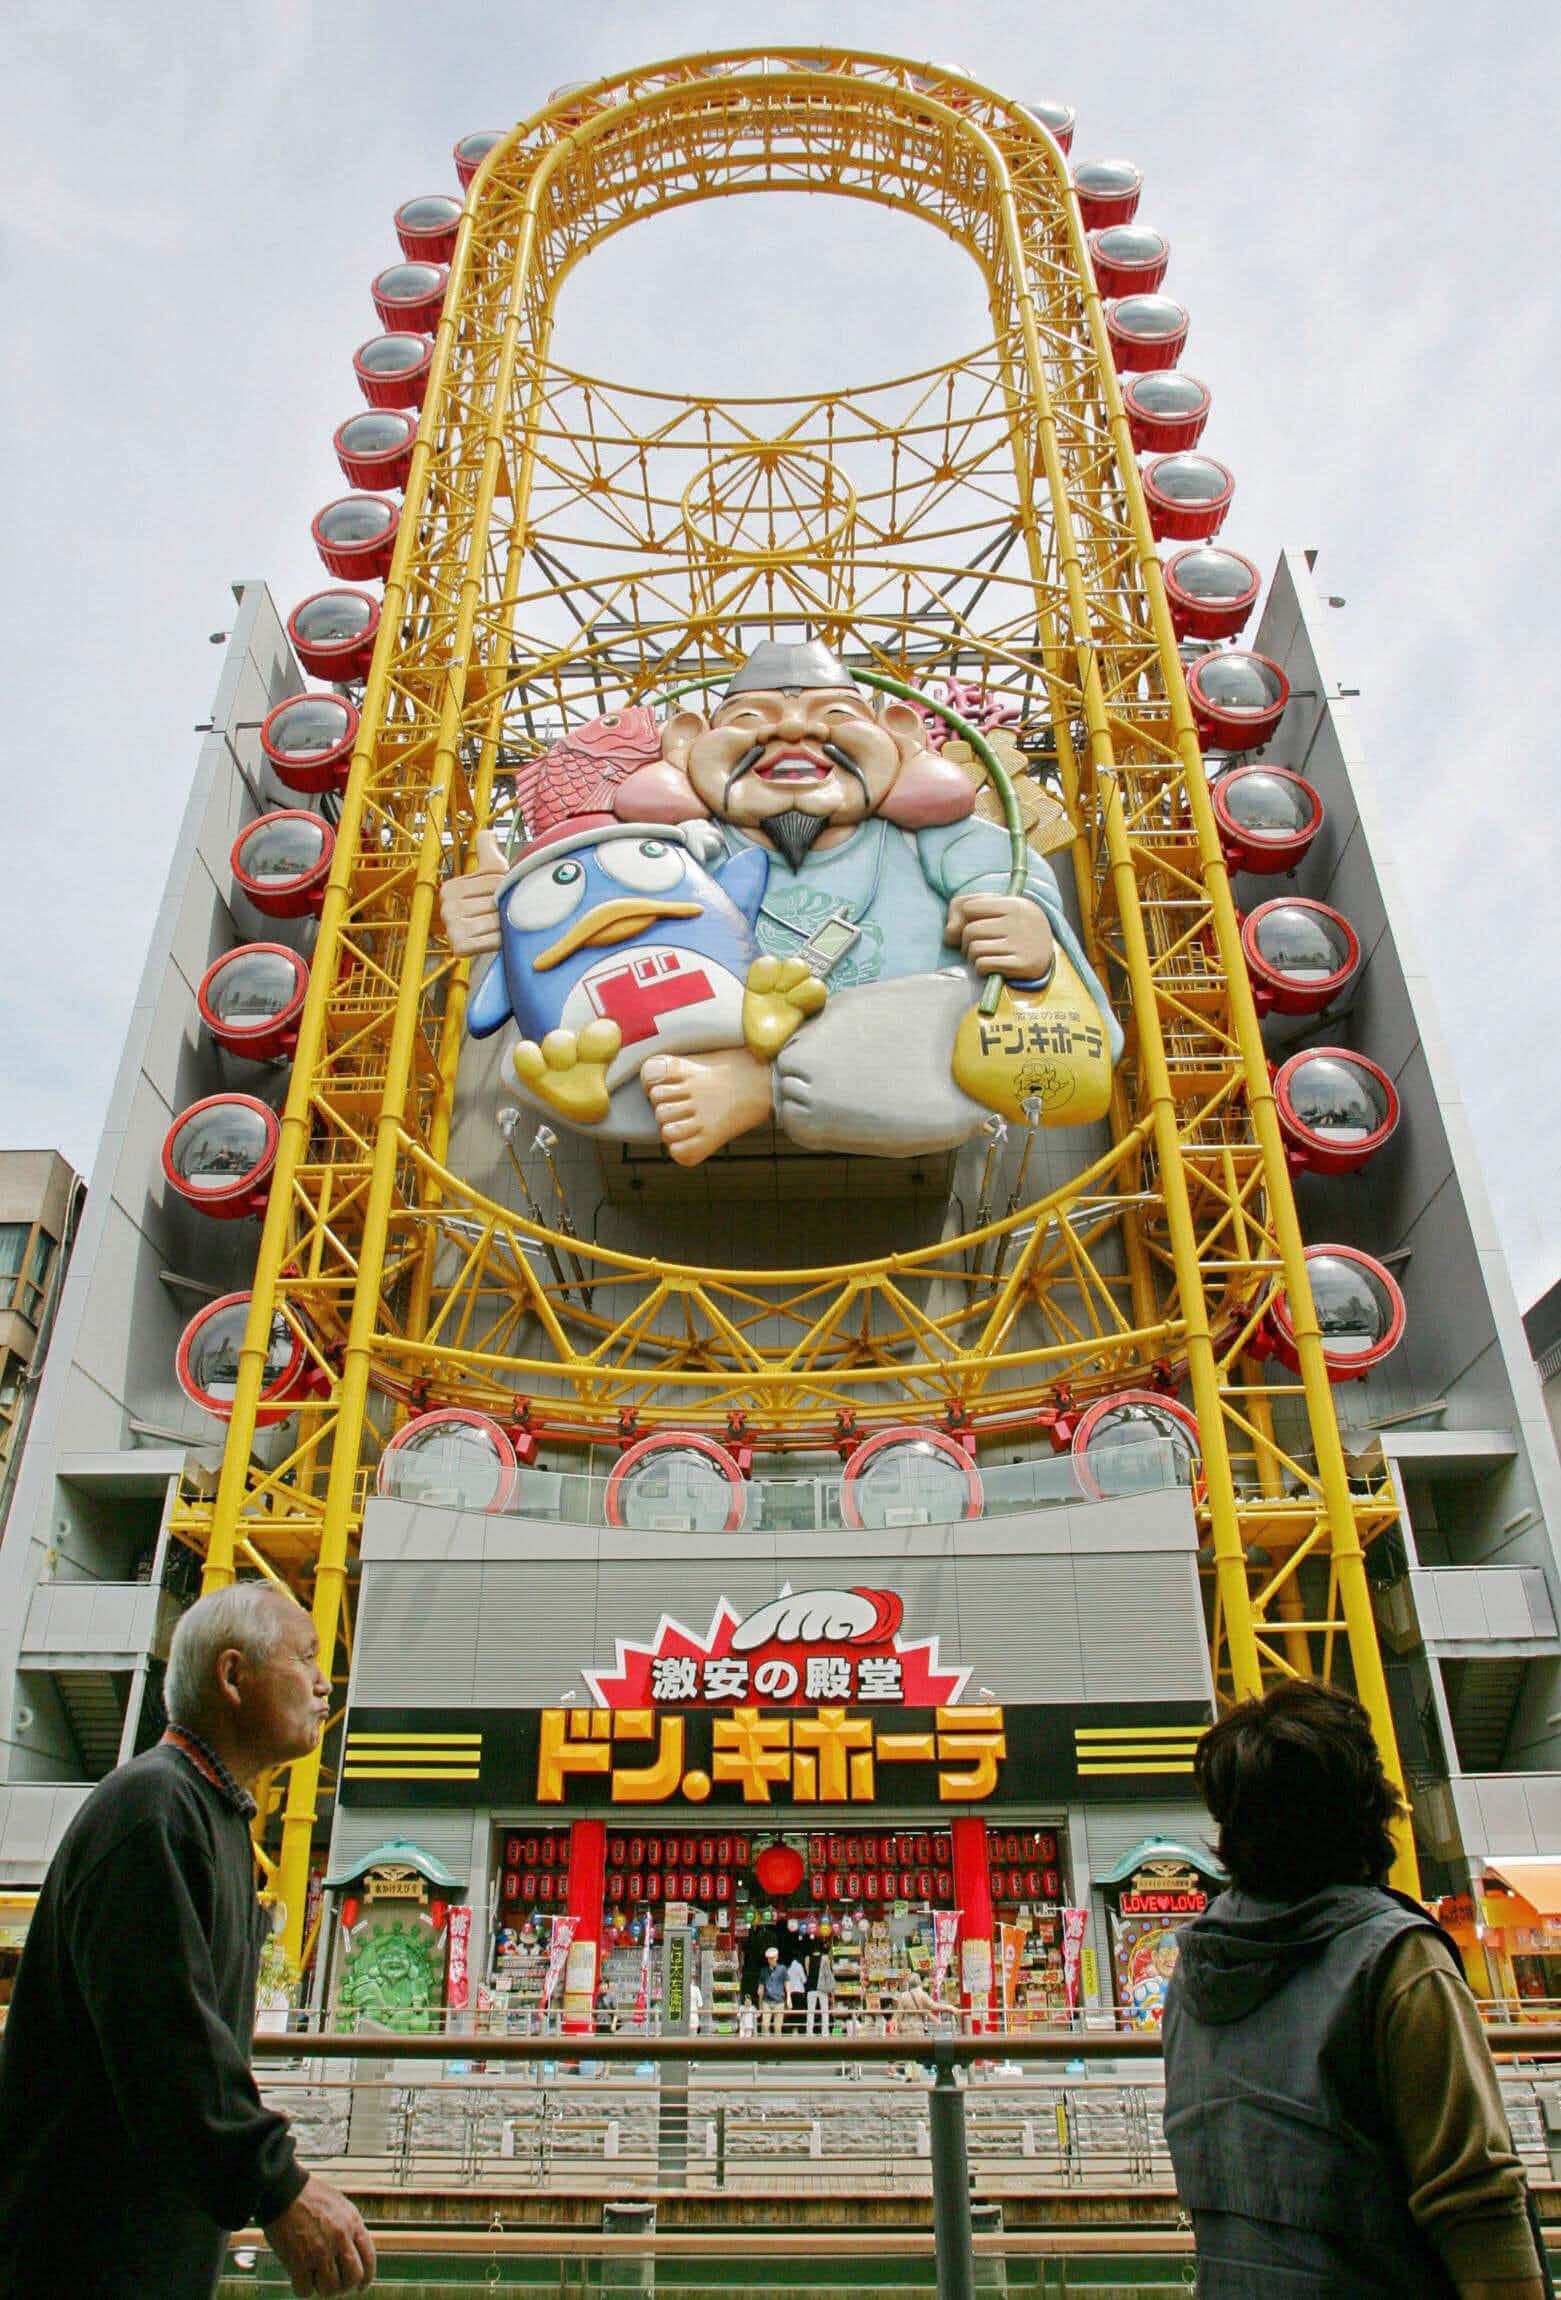 The famous Osaka Ferris wheel turns again after nine-year hiatus